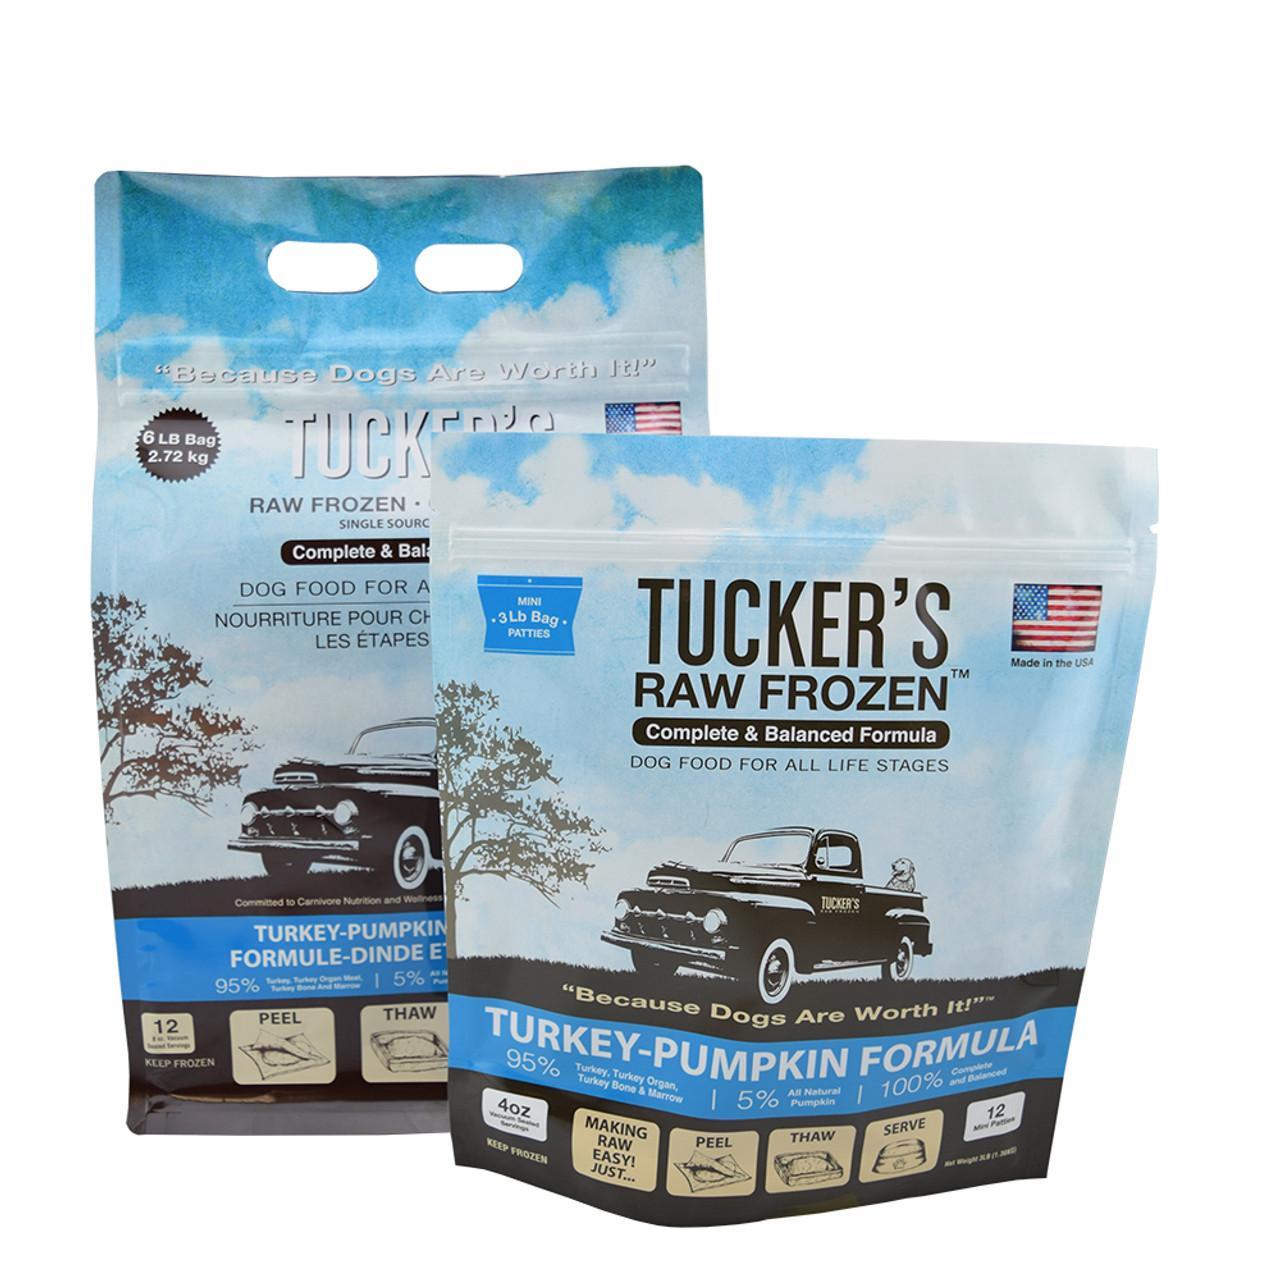 Tucker's Raw Frozen Turkey-Pumpkin Recipe Dog Food